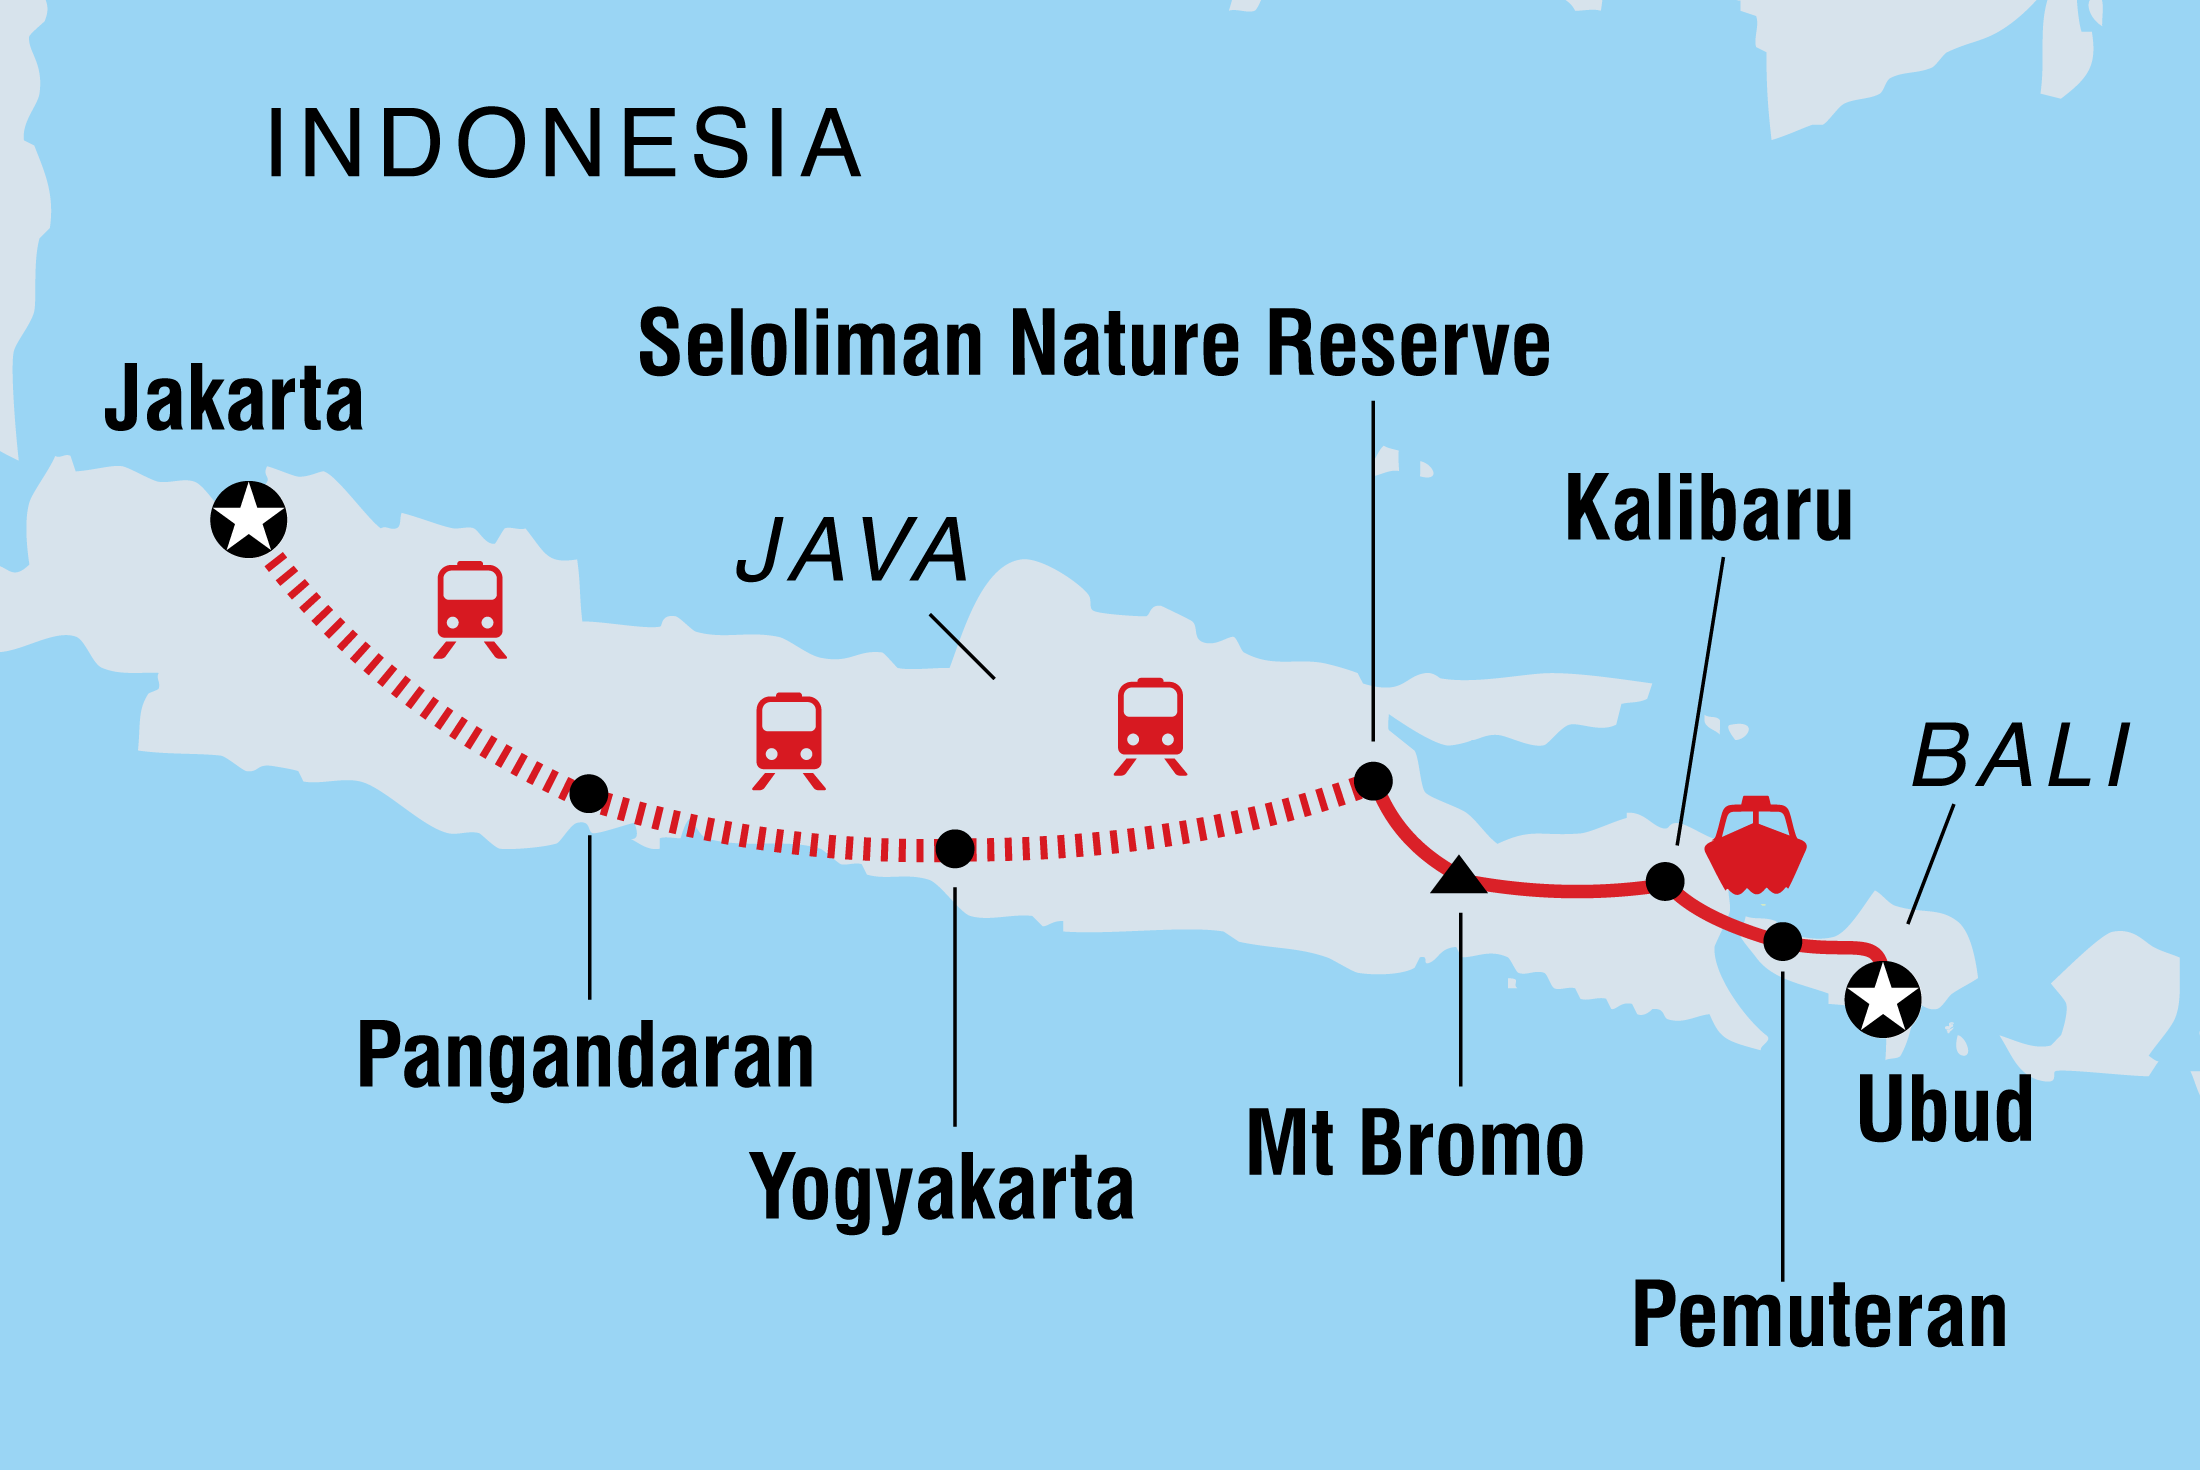 Indonesia Tours & Travel | Intrepid Travel US